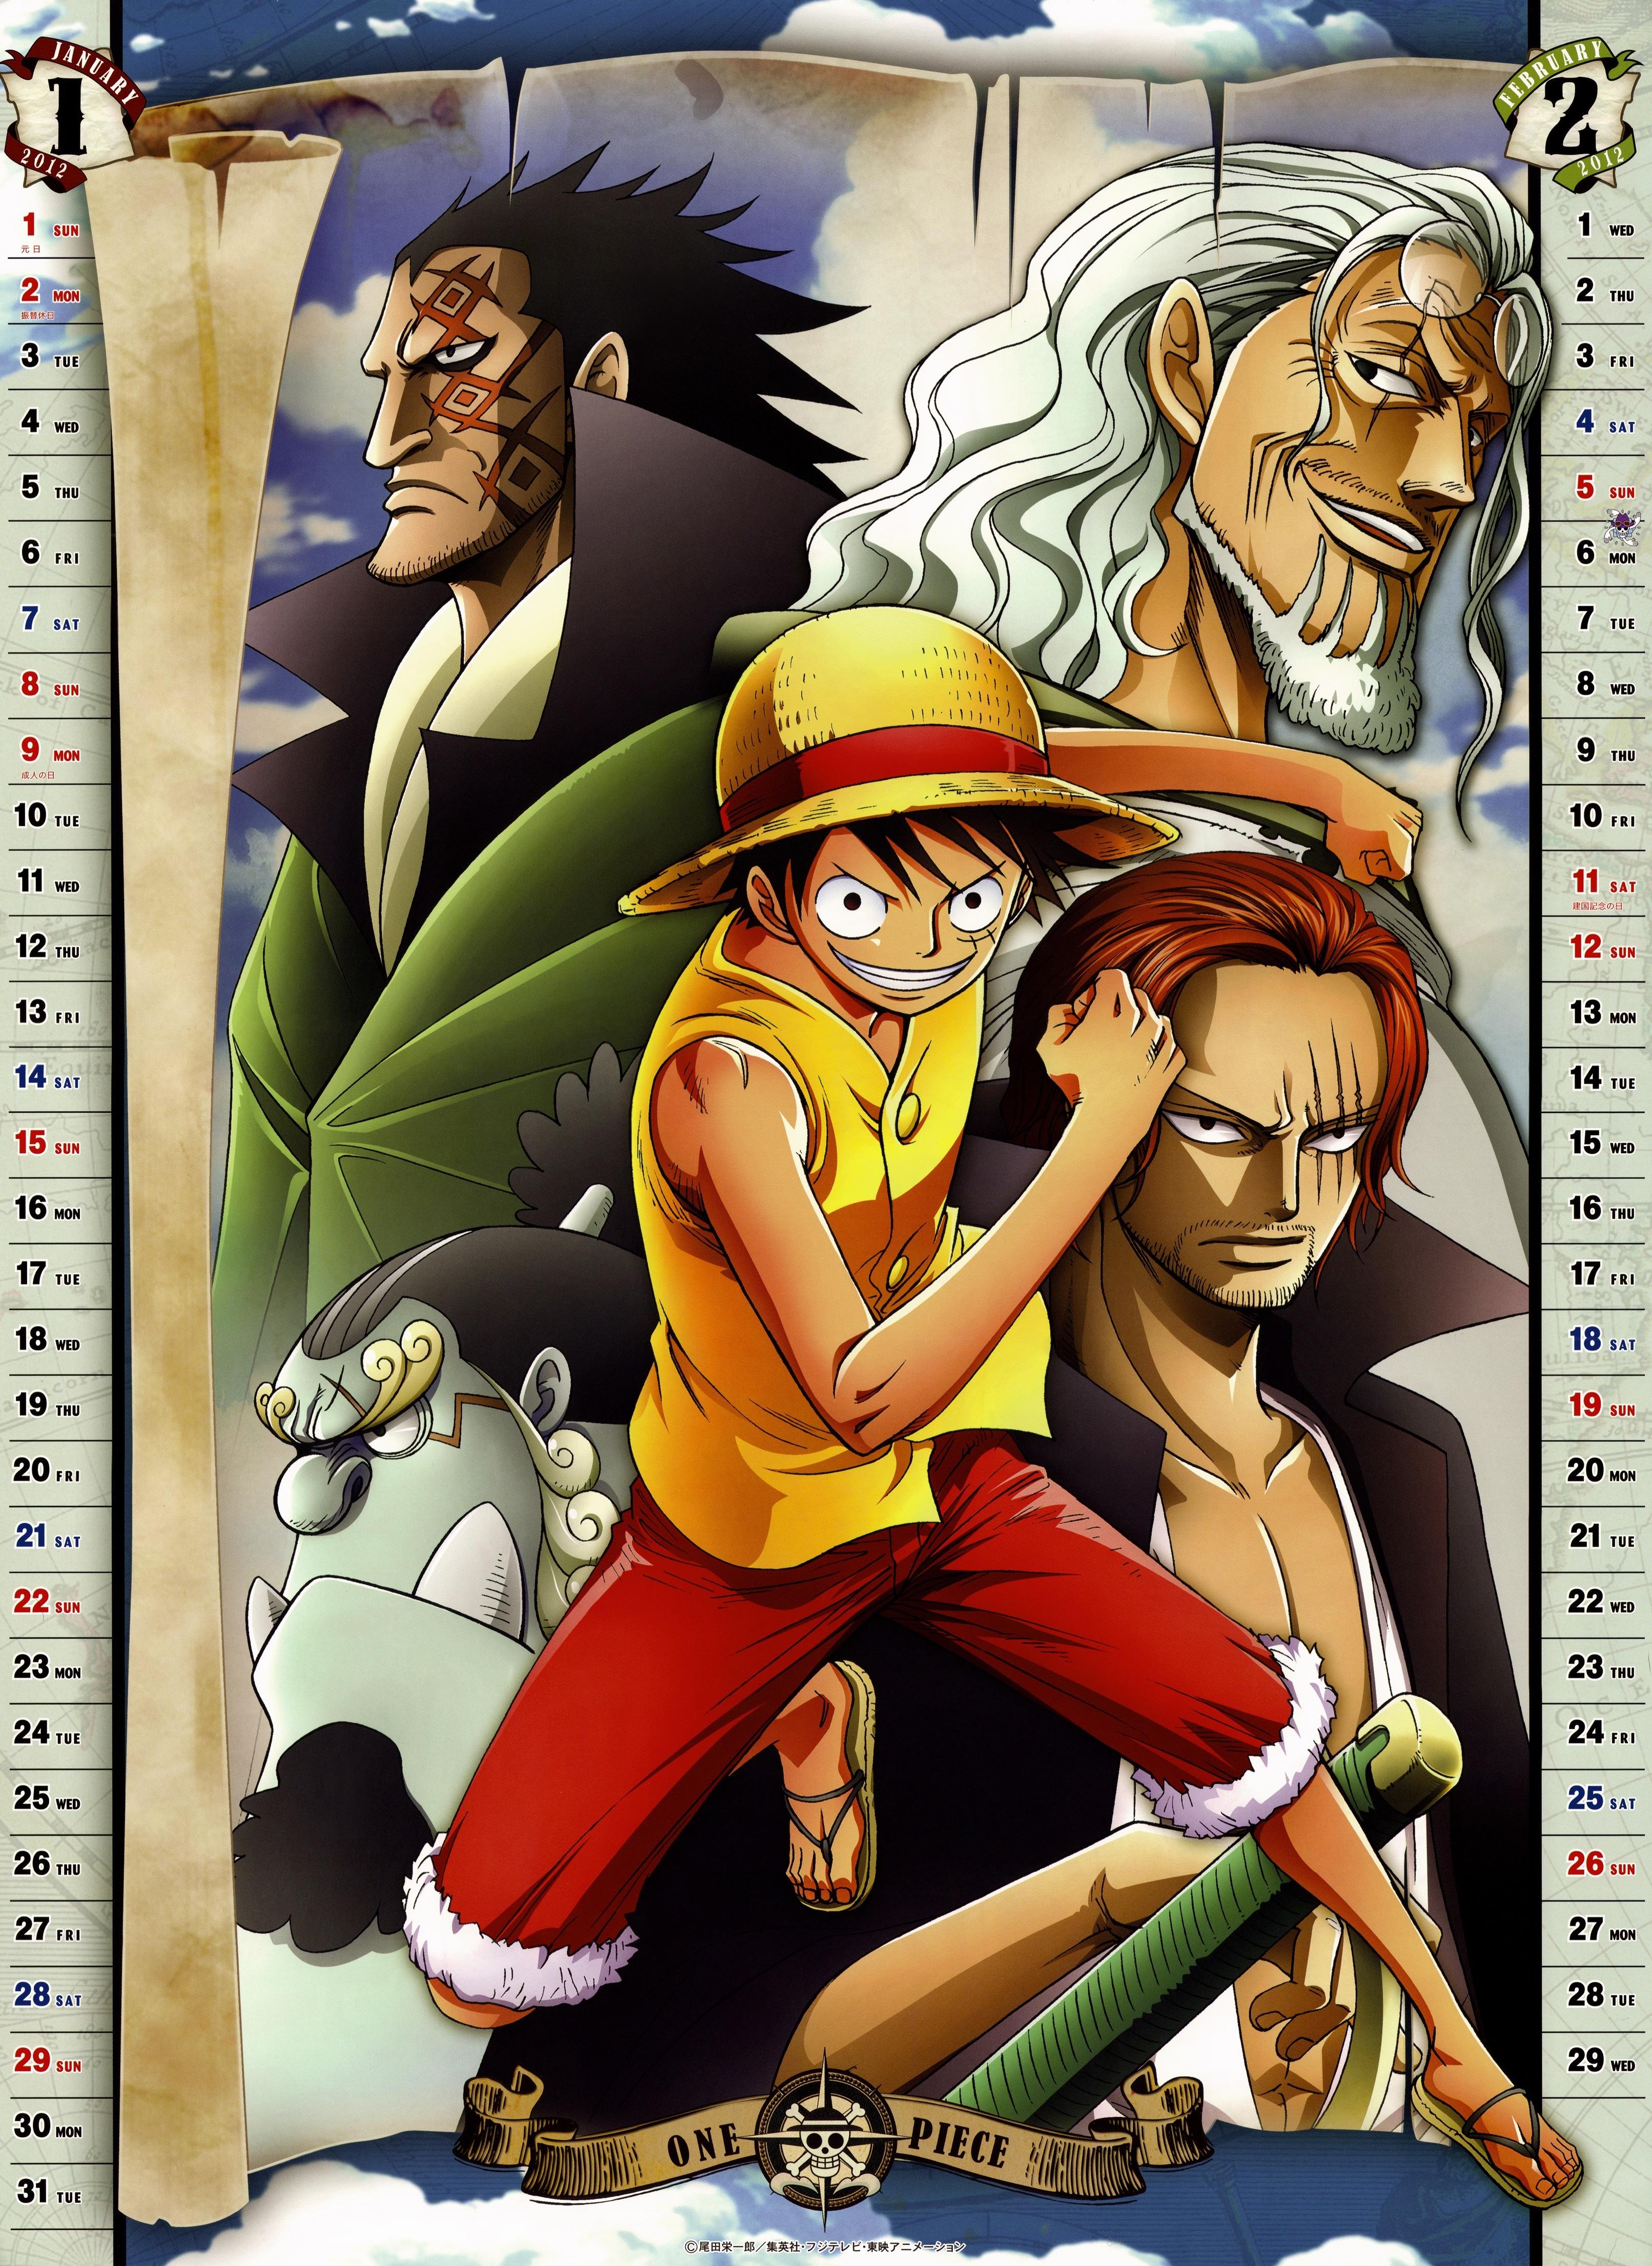 One Piece Unlimited Cruiseエピソード1波に揺れる秘宝ギ 集英社 価格 中井18のブログ